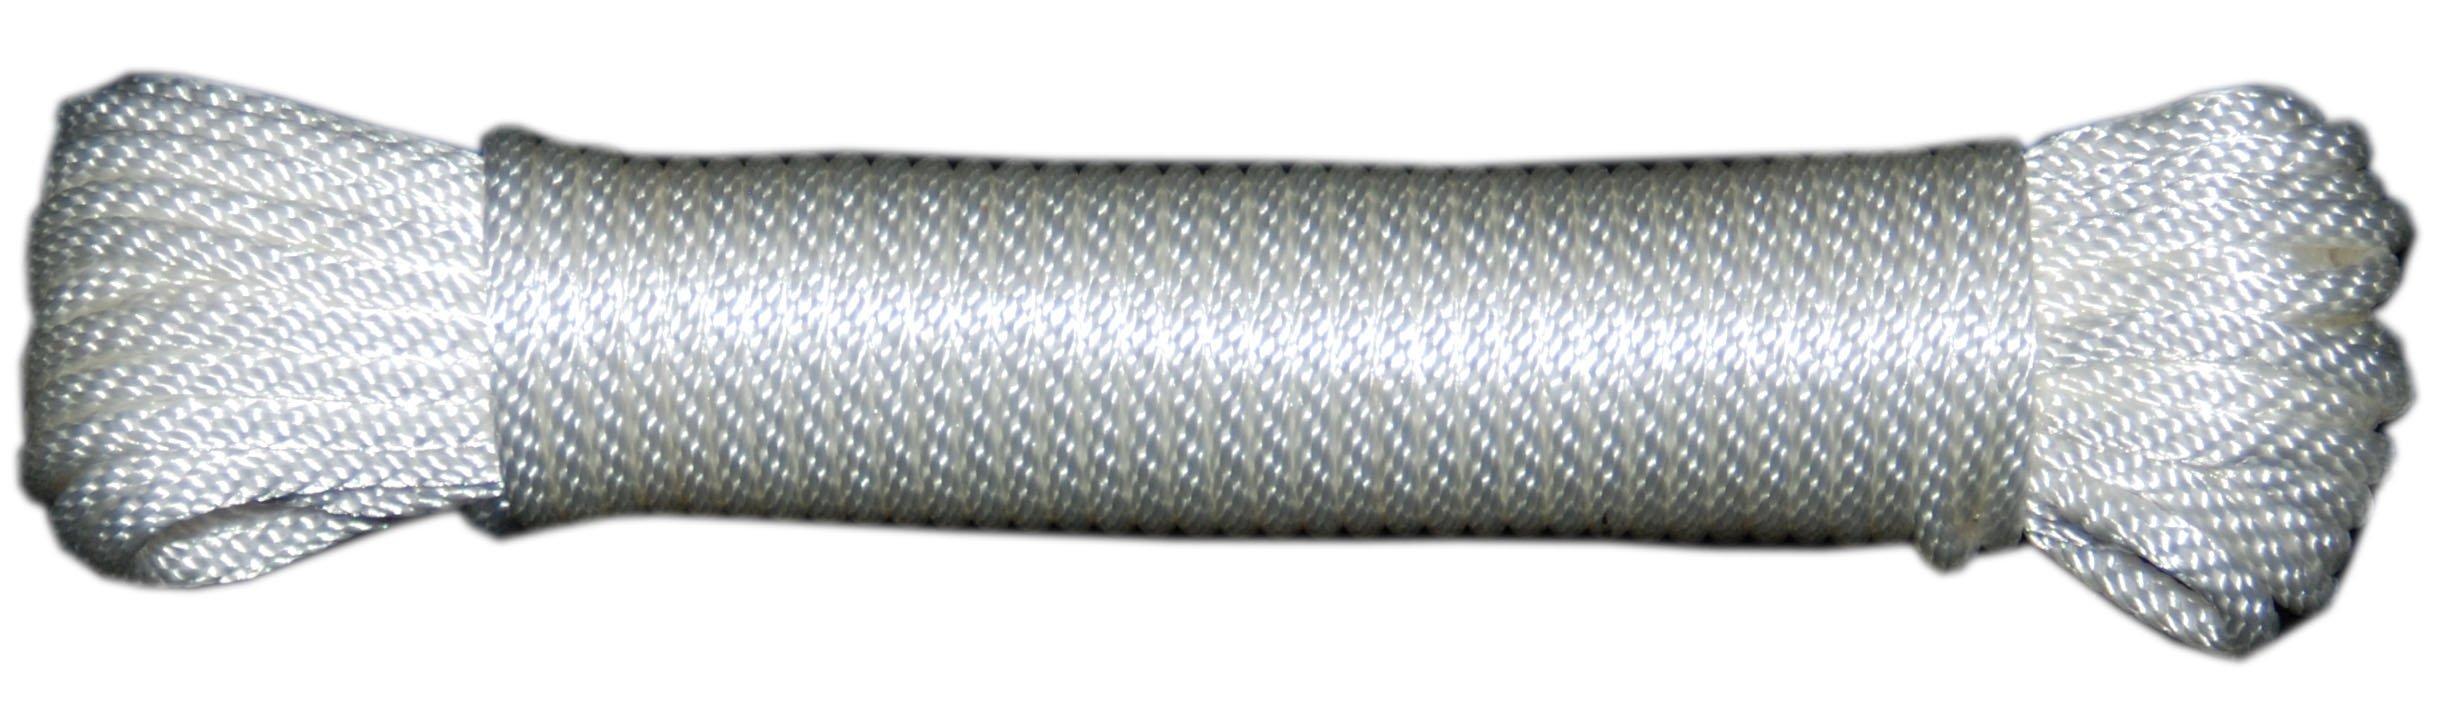 T.W . Evans Cordage 44-060 3/16-Inch Solid Braid Nylon Rope 100-Feet Hank